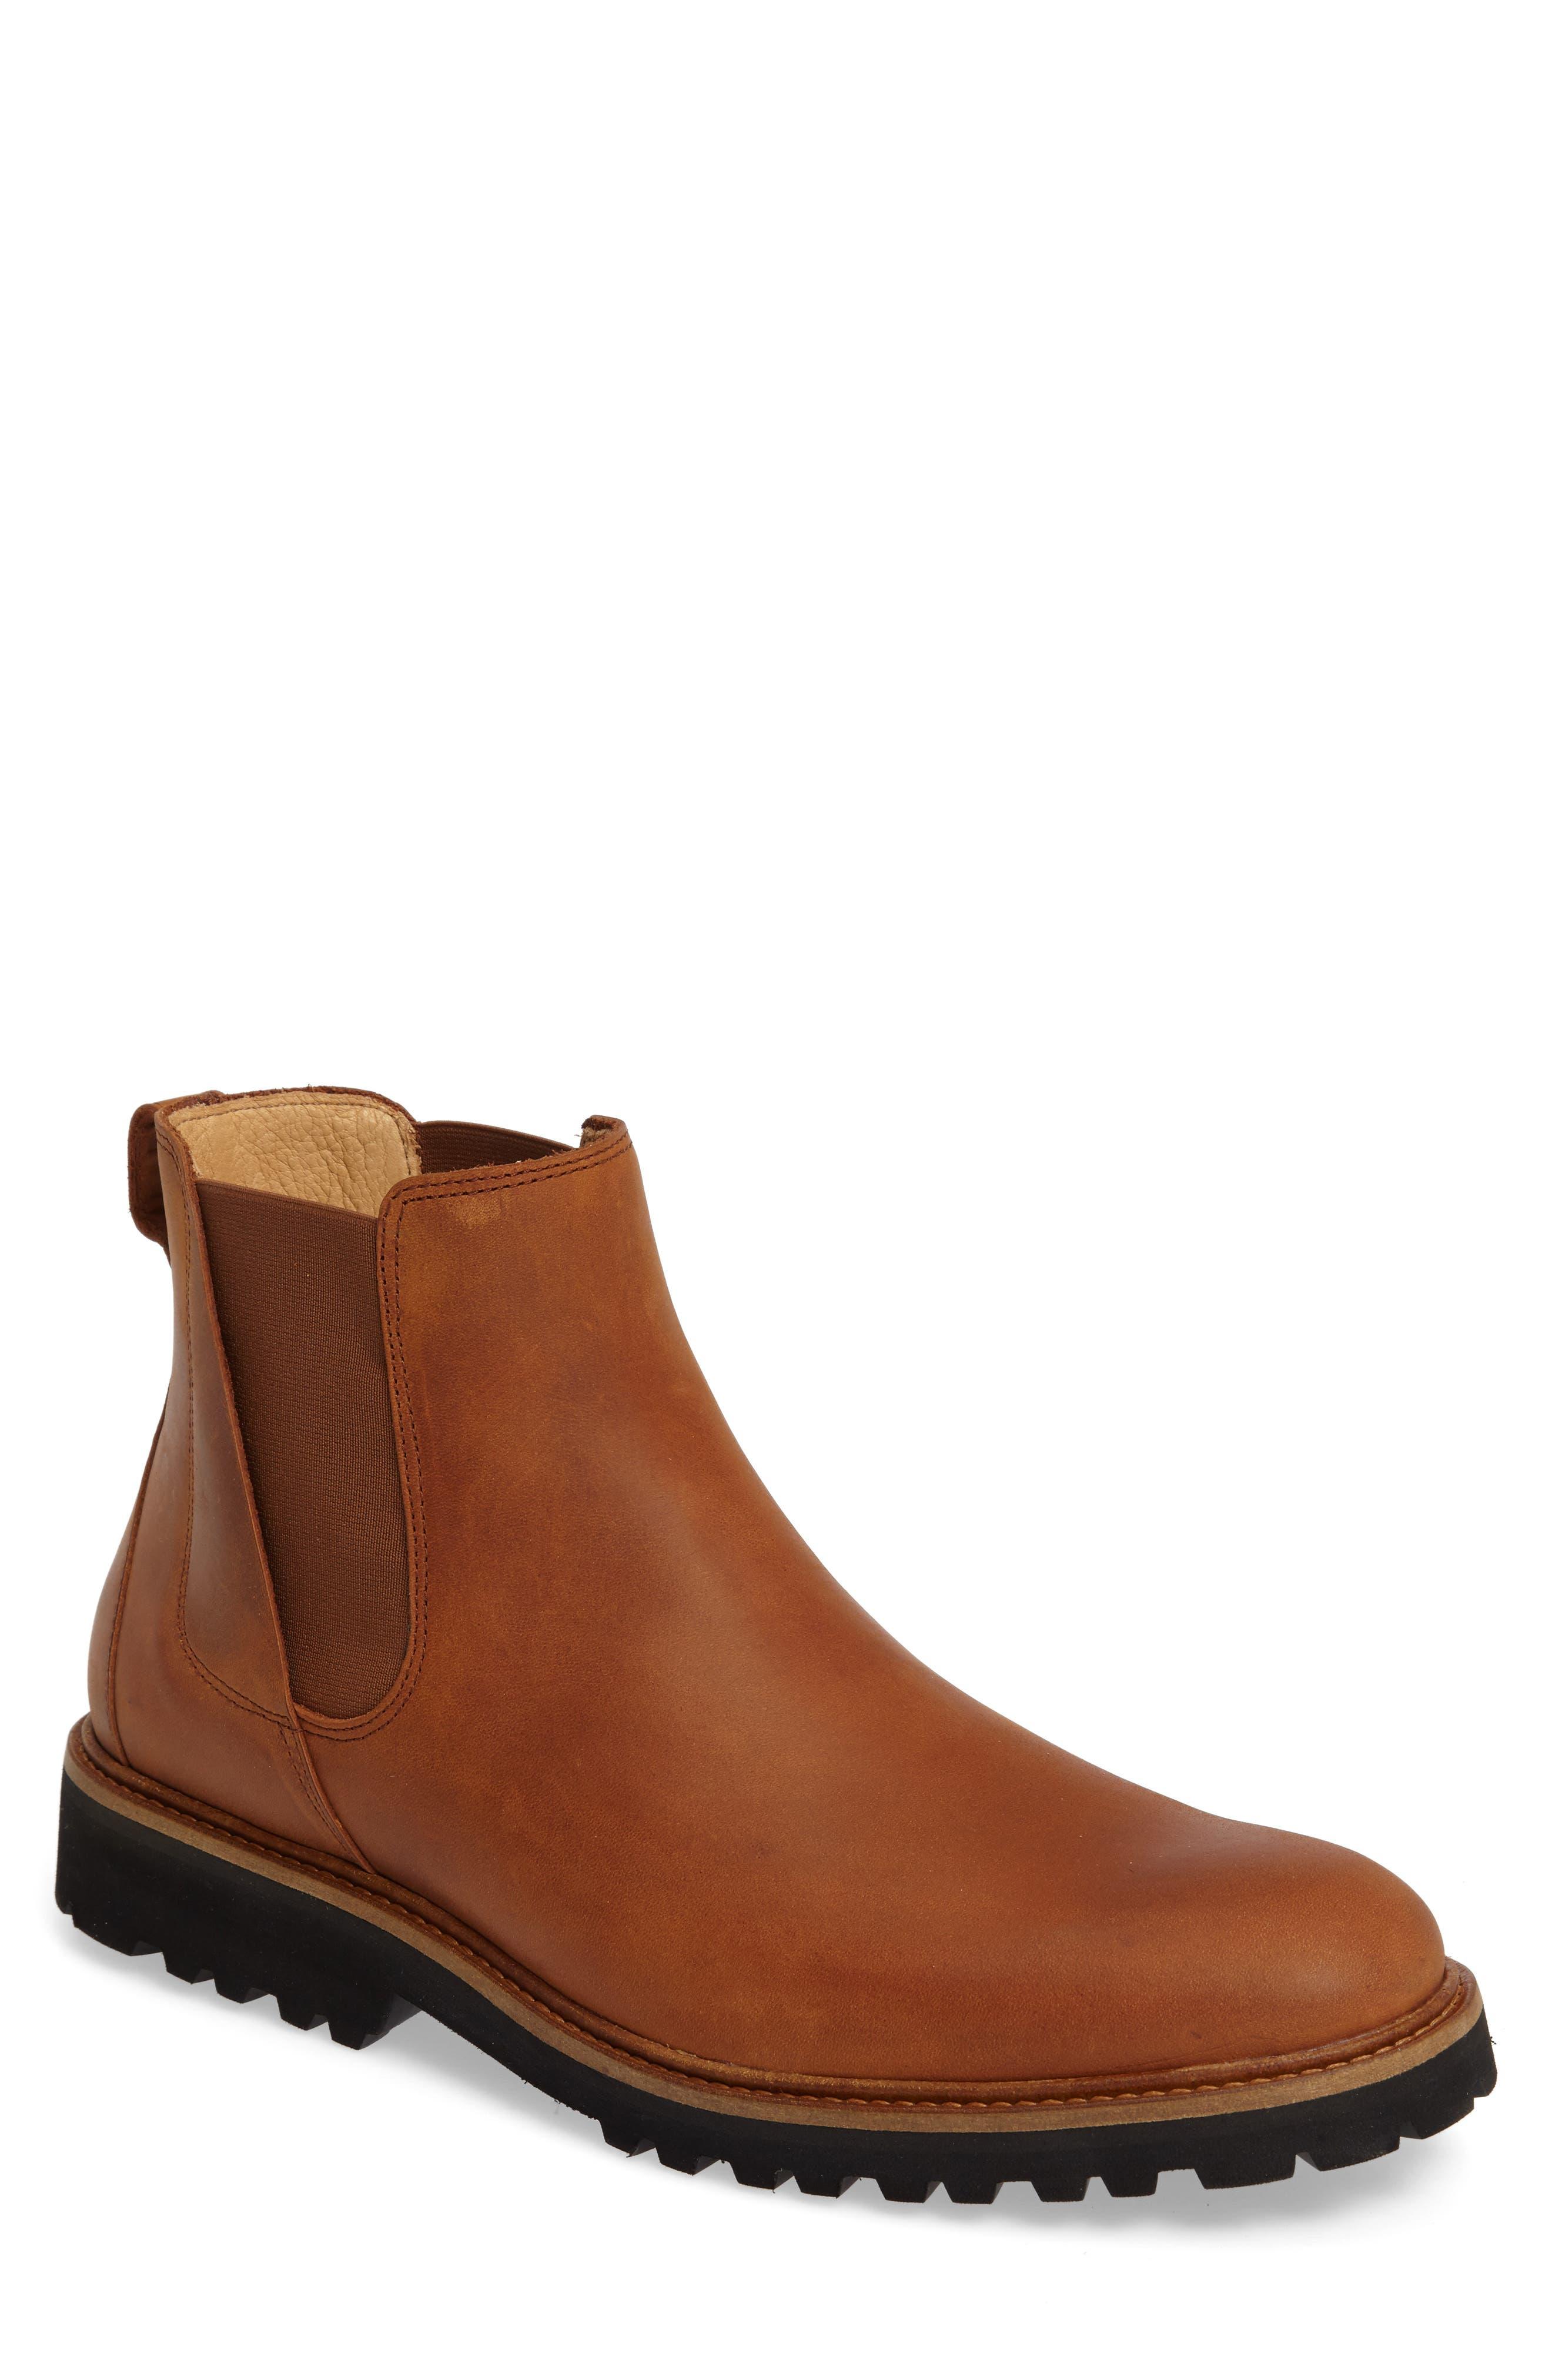 Crosstown Cowboy Chelsea Boot,                         Main,                         color, Tan Waxhide/ Black